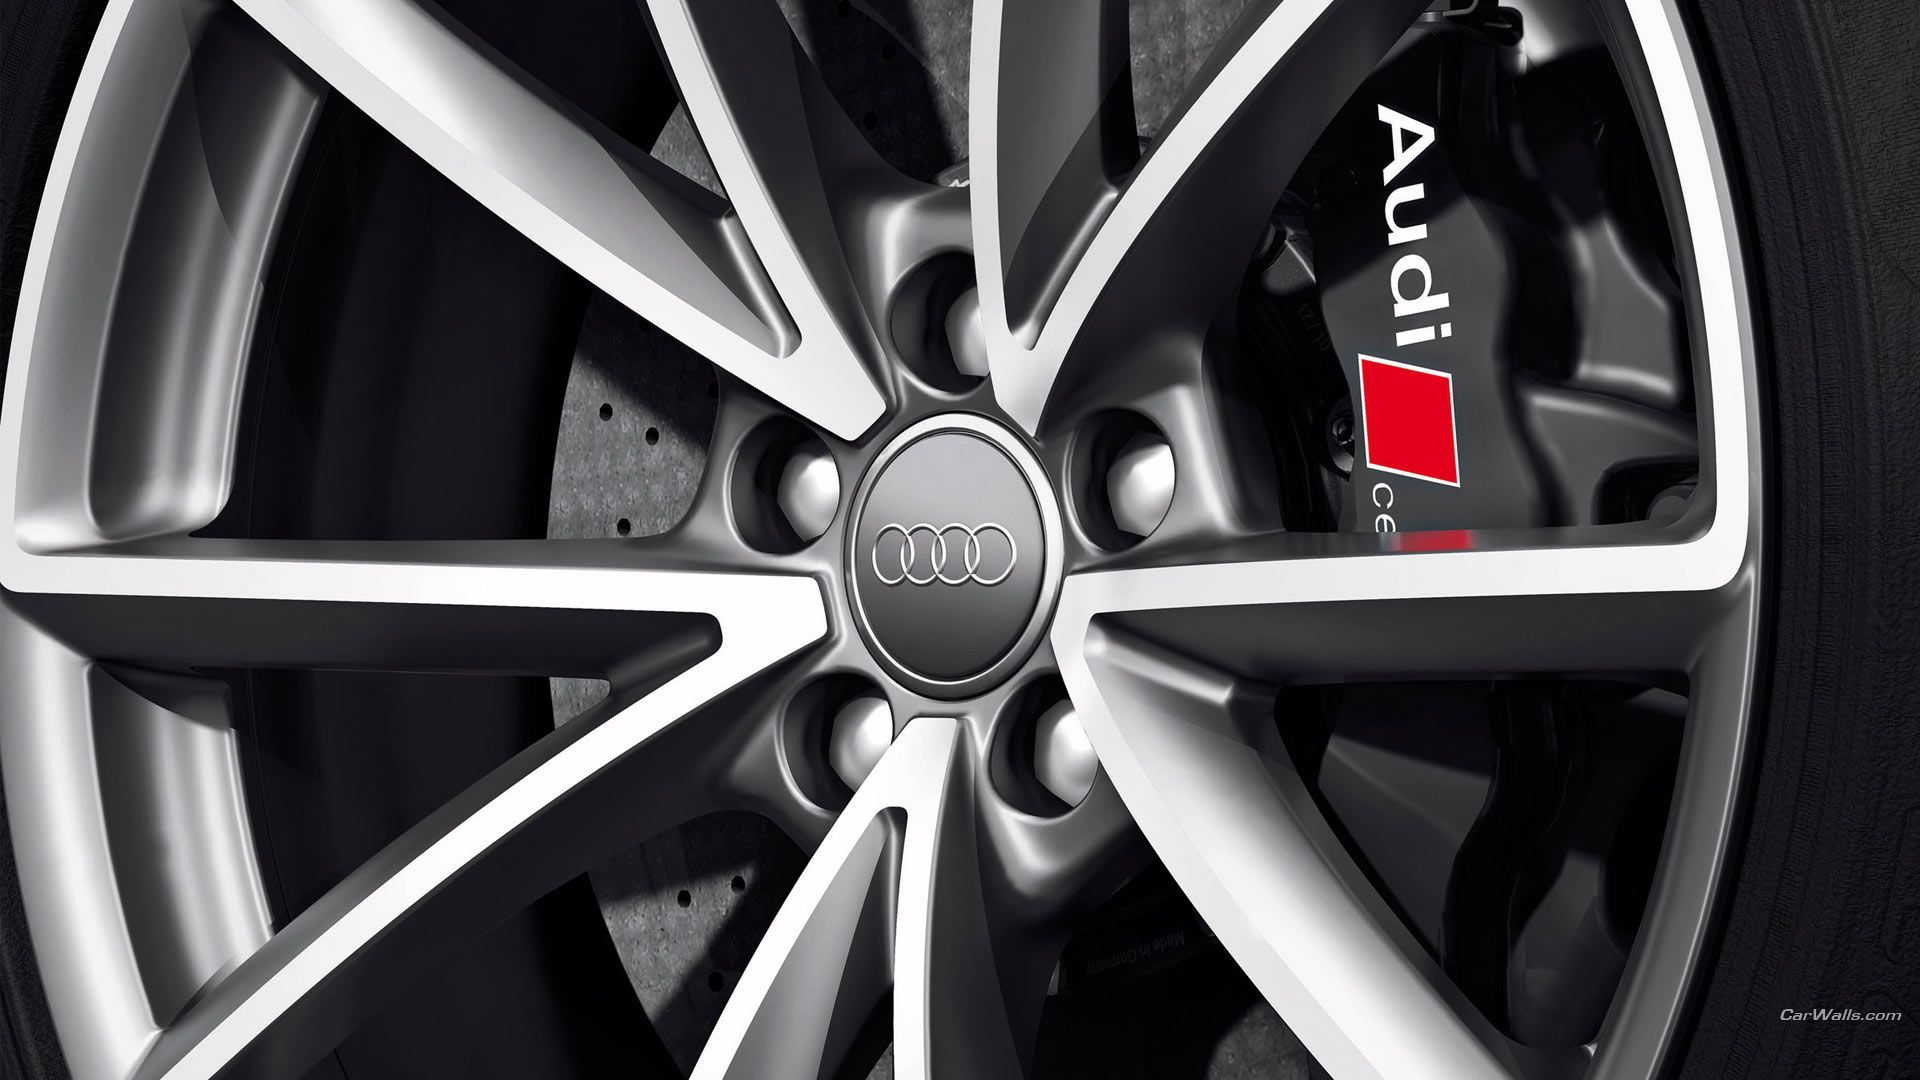 Audi Rs4 Avant 1024 X 768 Wallpaper Audi Audi Rs Audi Rs4